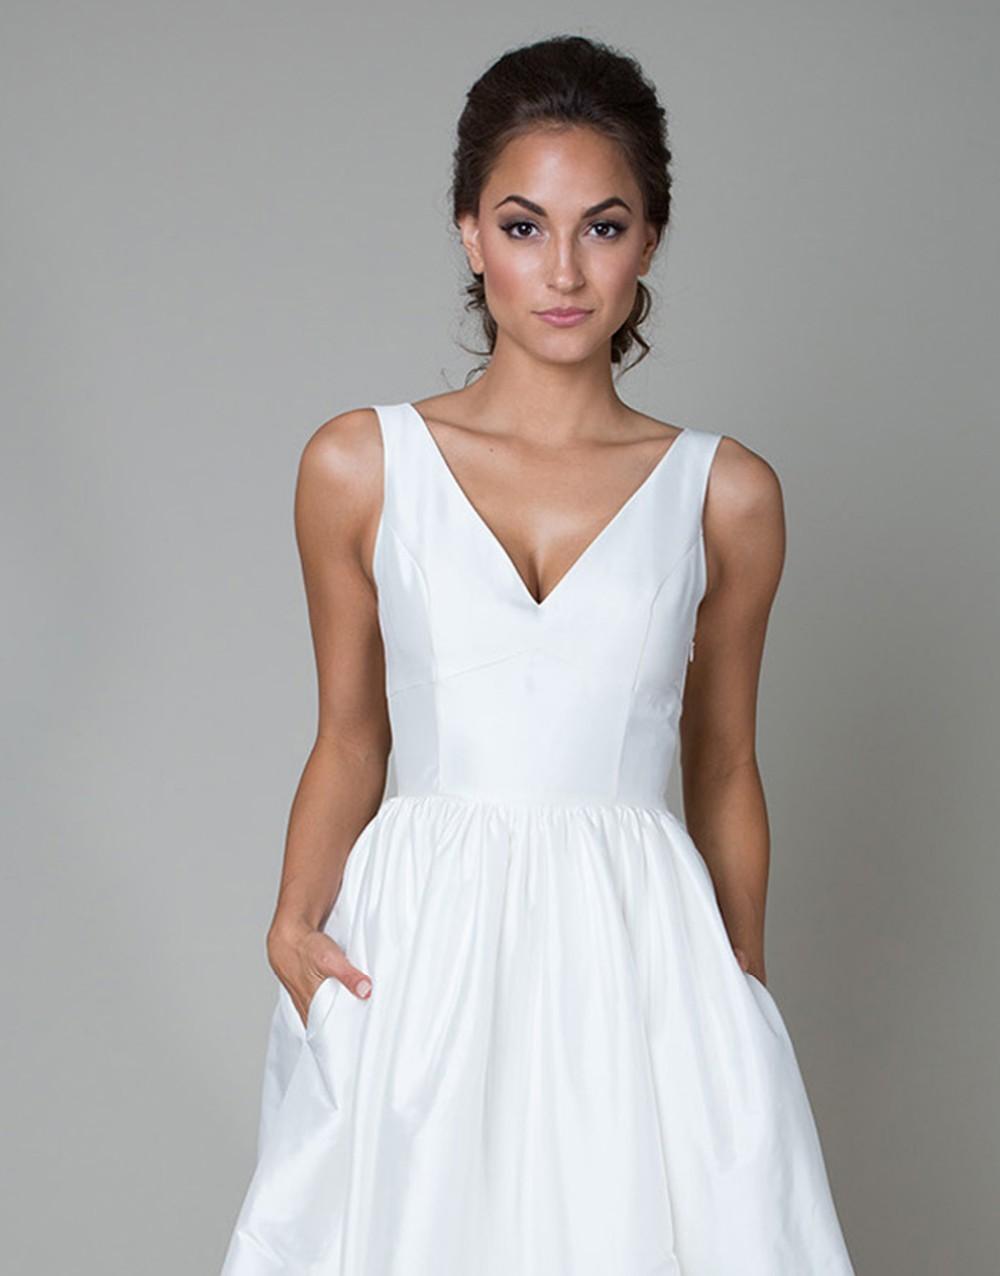 Vintage long white summer boho beach wedding dress with pockets 2015 v neck see through bridal gowns vestidos de noiva UD-442 4